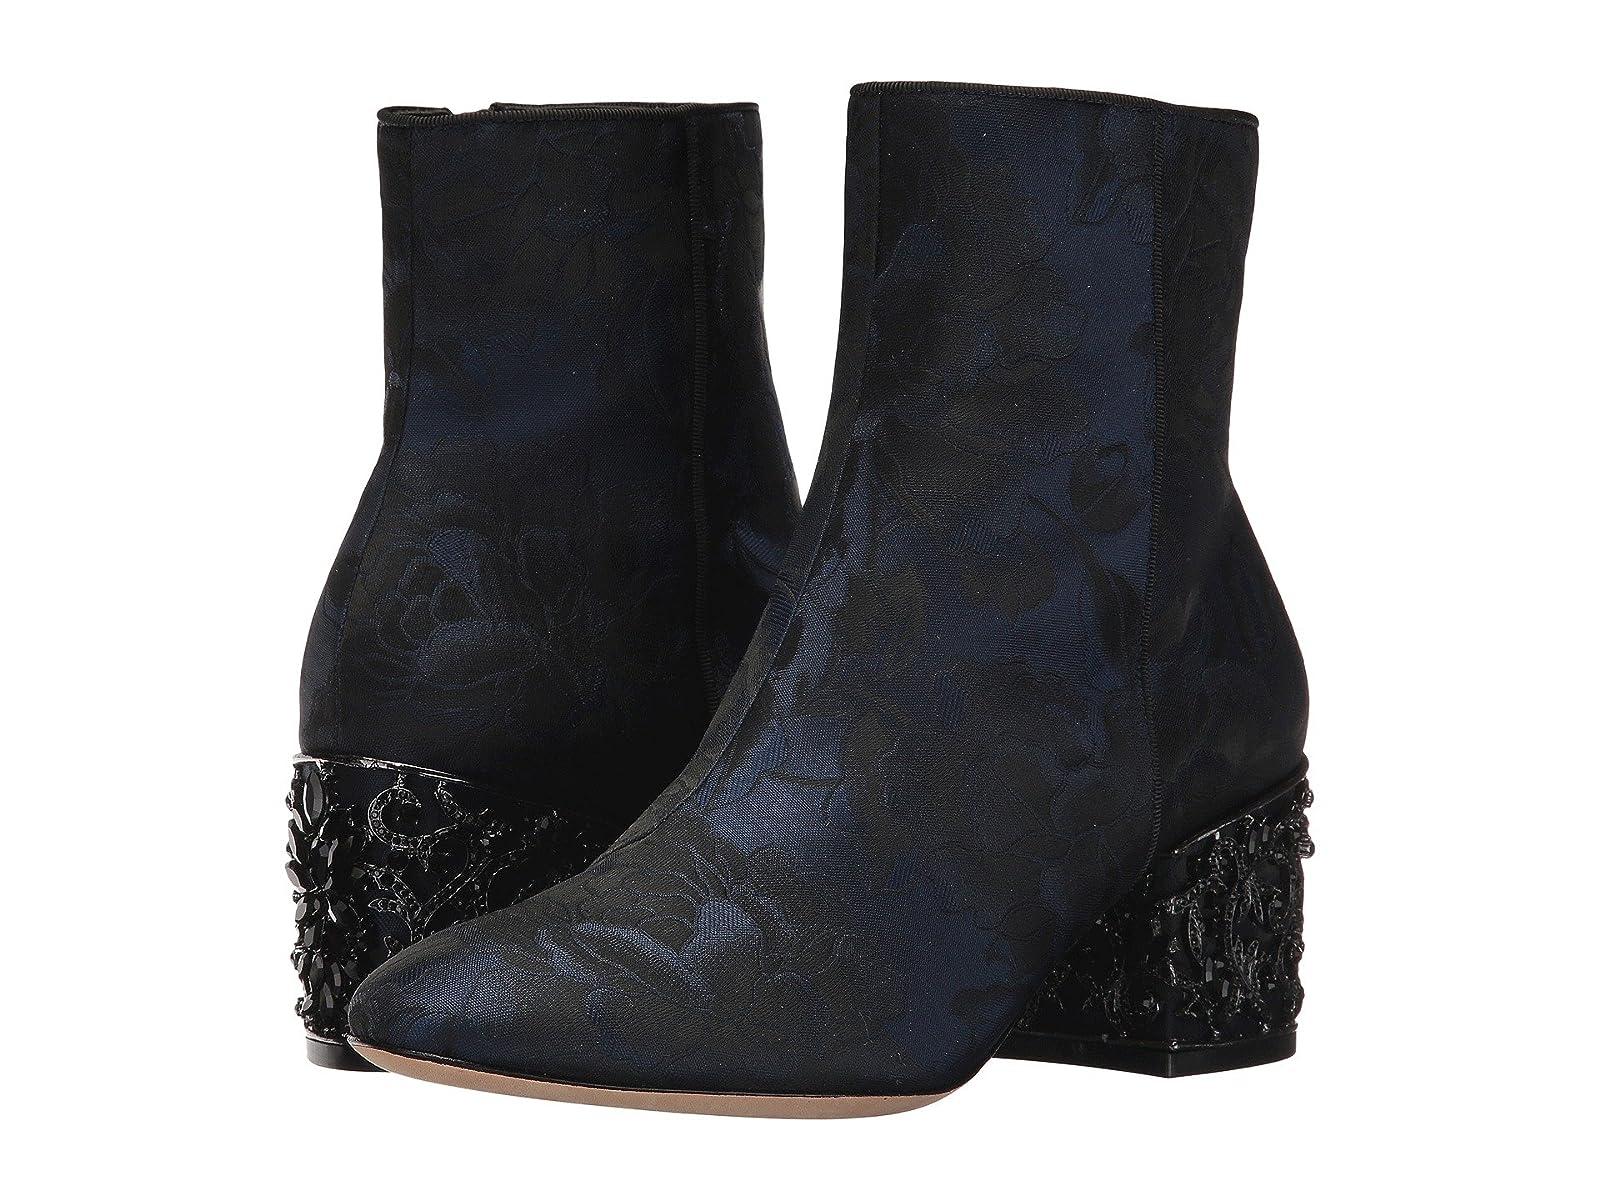 Badgley Mischka MarthaCheap and distinctive eye-catching shoes